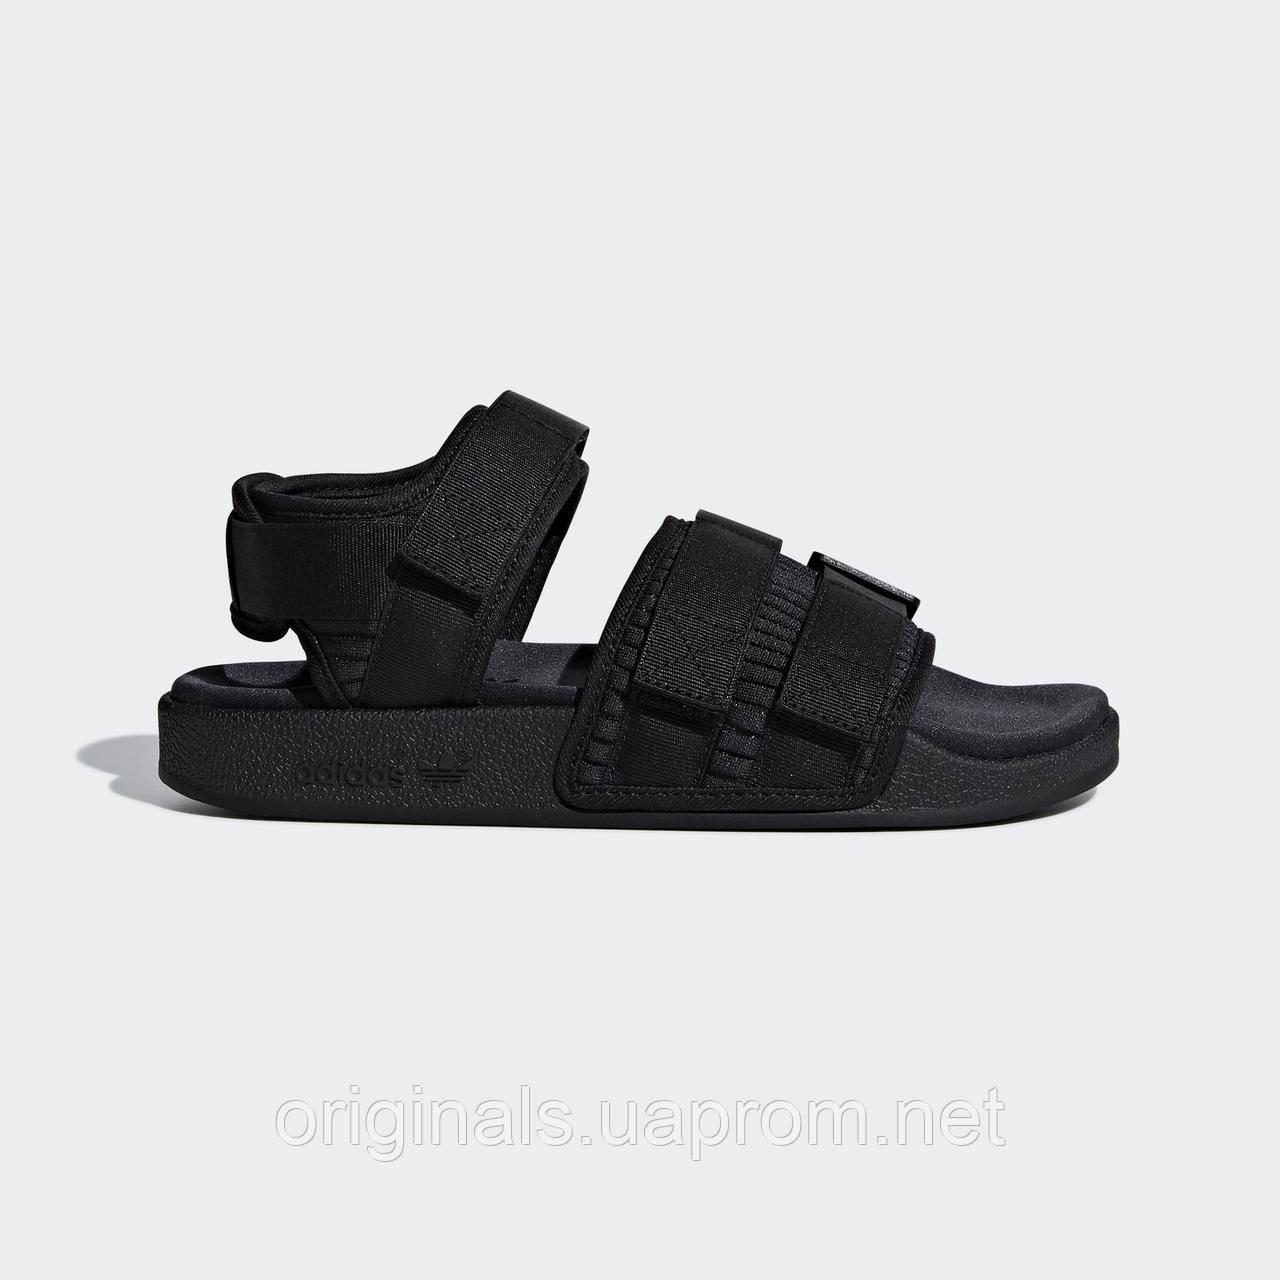 Черные сандалии Adidas Adilette 2.0 W CG6623 - 2019